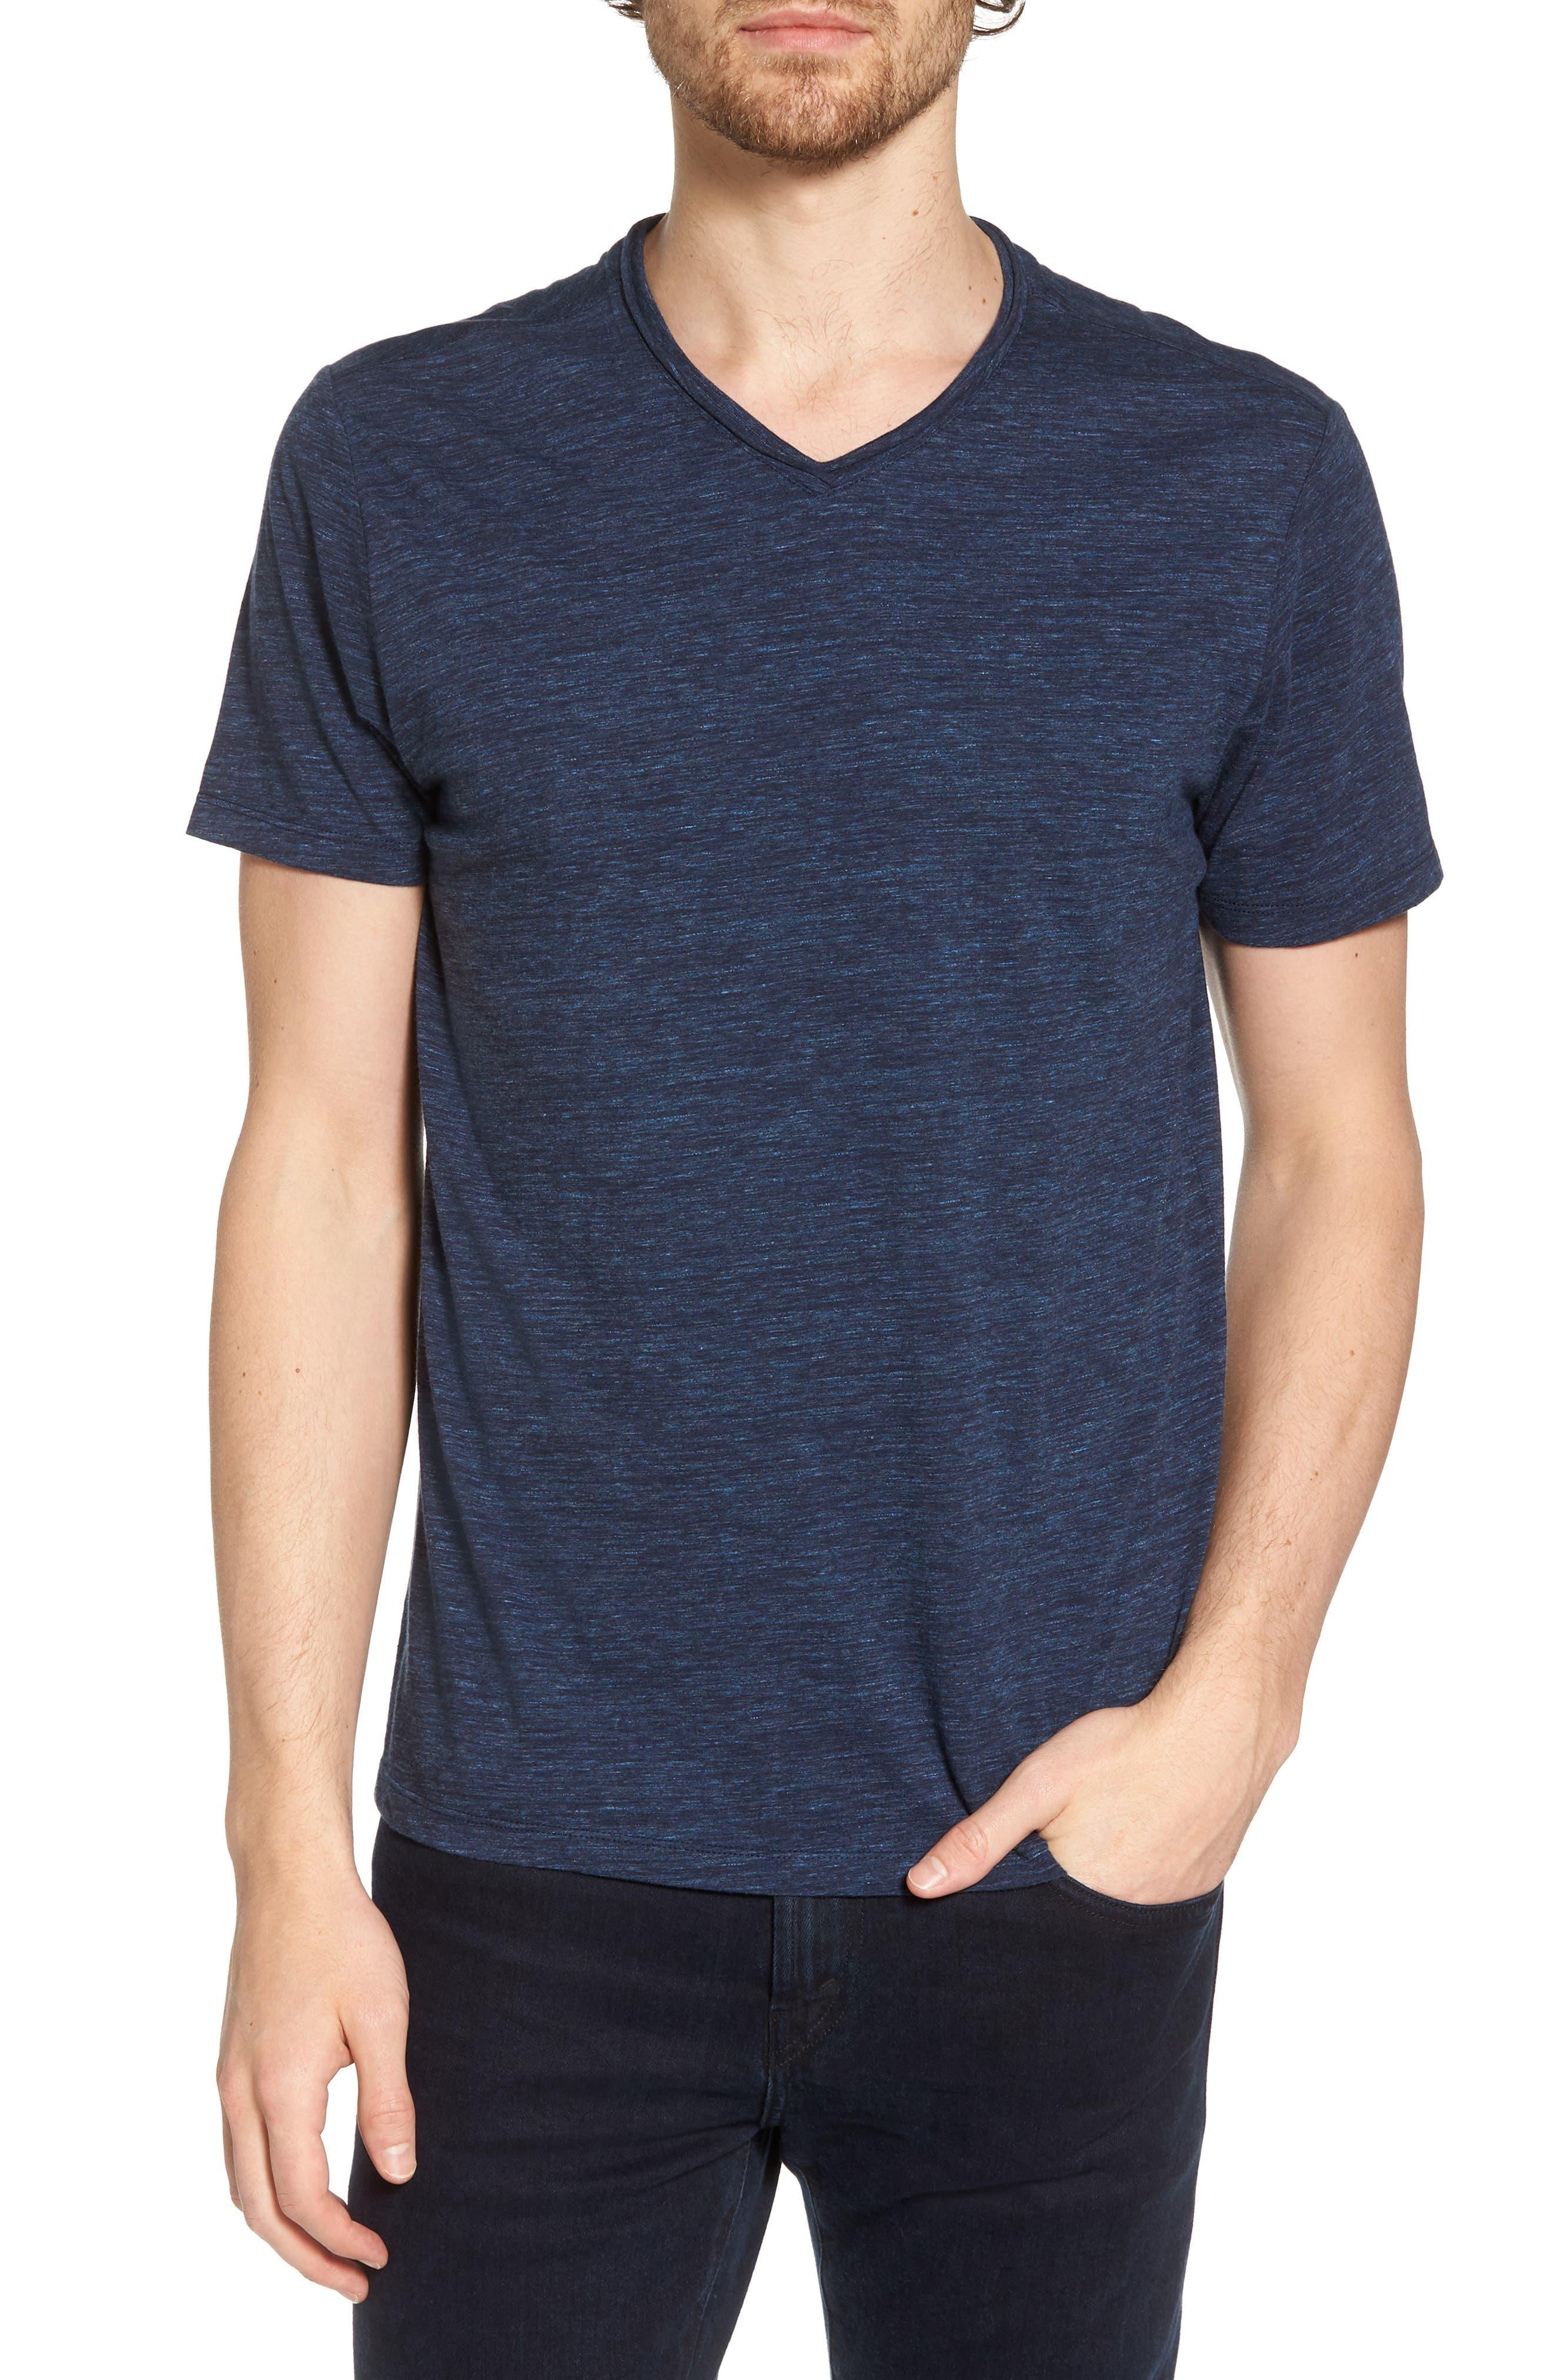 John Smith T-Shirt,                             Main thumbnail 1, color,                             Navy